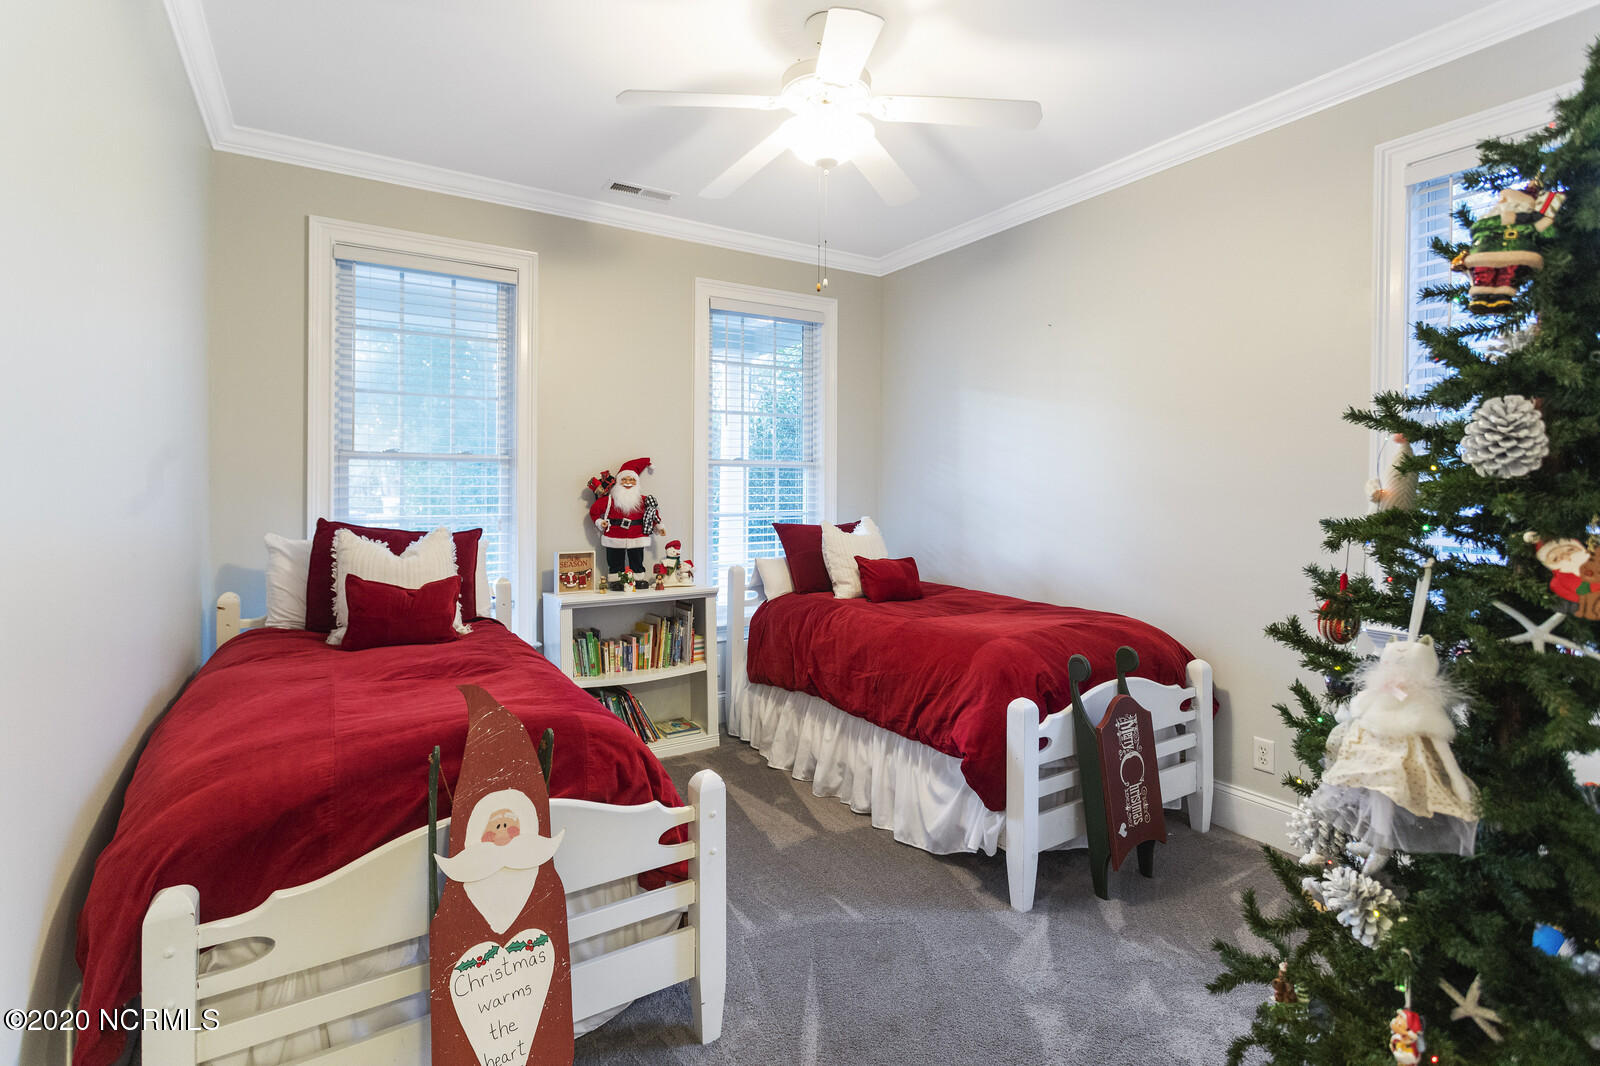 1210 Athena Court, Wilmington, North Carolina 28411, 4 Bedrooms Bedrooms, 7 Rooms Rooms,3 BathroomsBathrooms,Single family residence,For sale,Athena,100249007